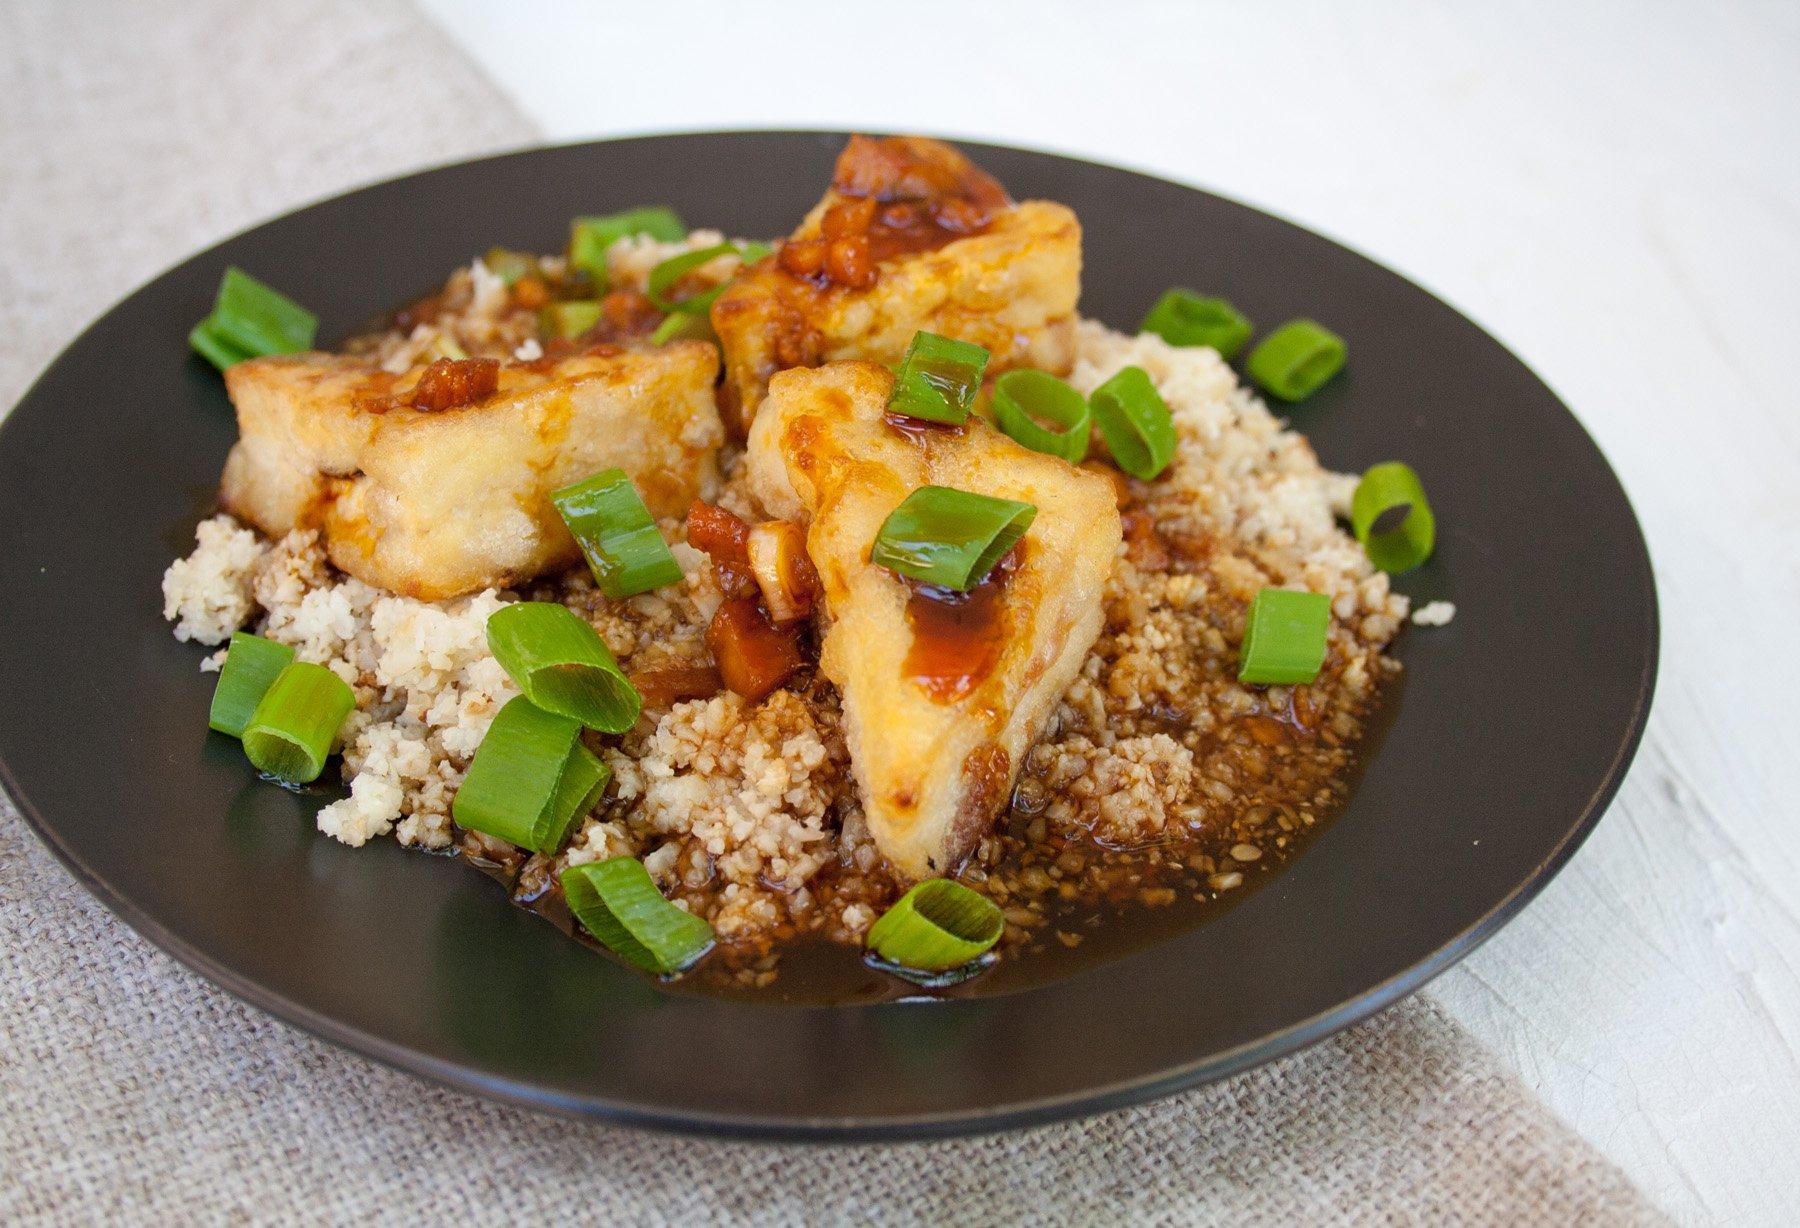 Vegan Asian Recipes - Cover